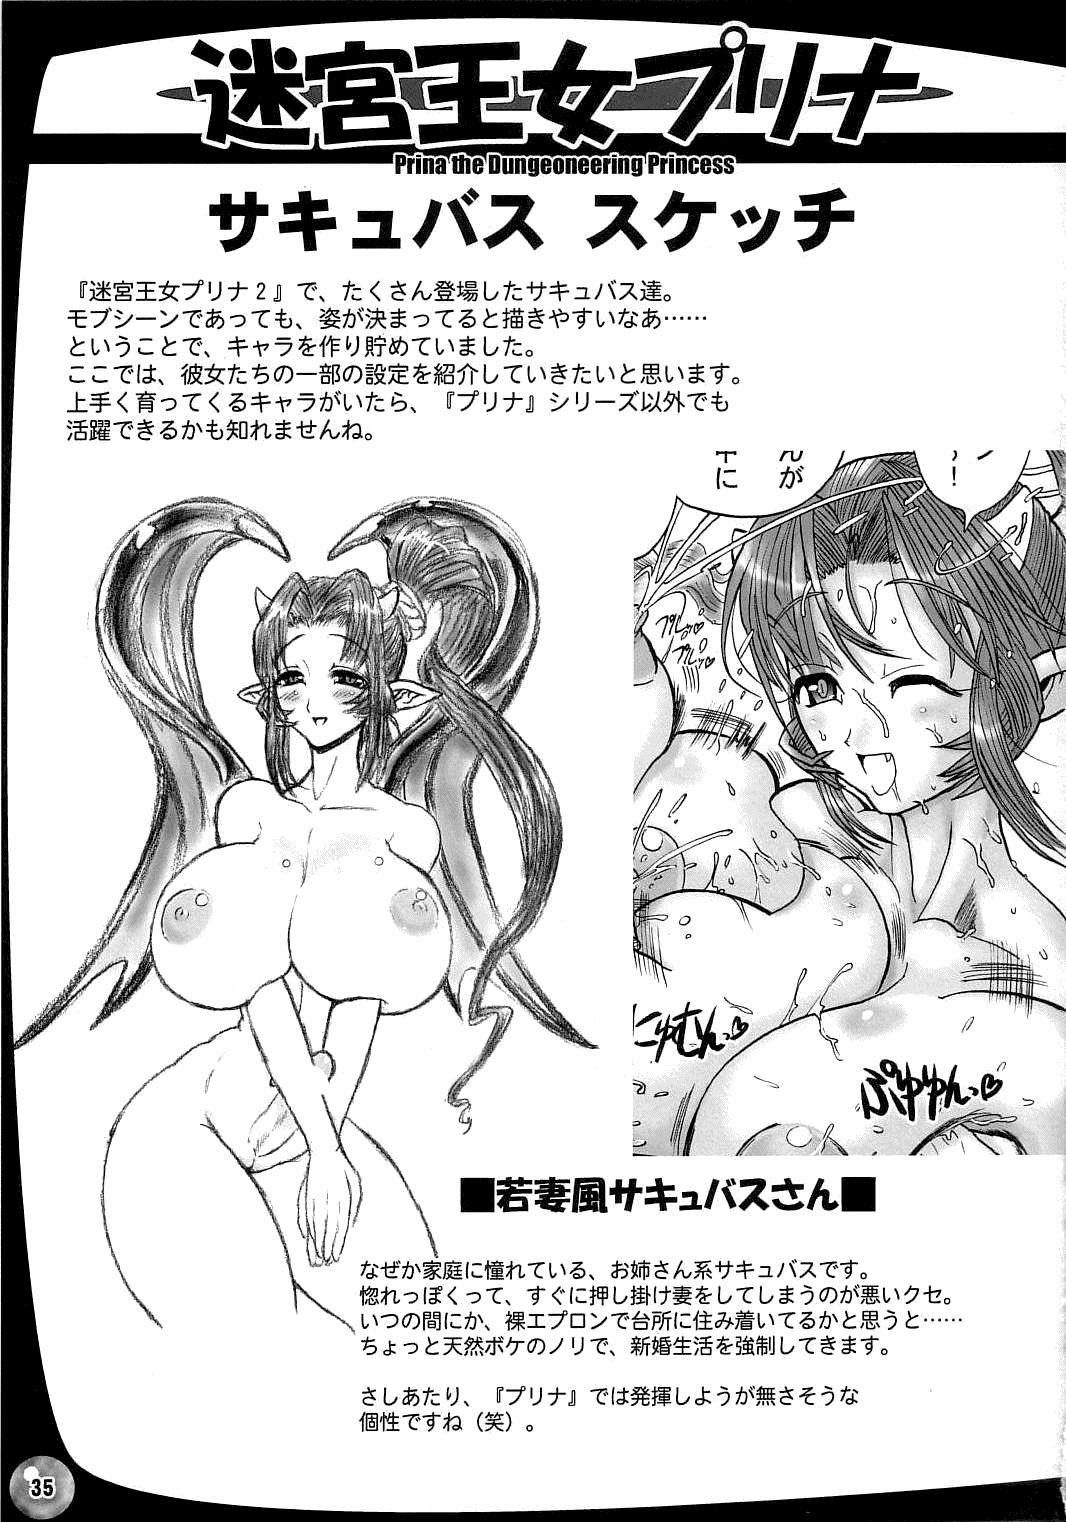 The Great Work of Alchemy Vol.15 - Meikyuu Oujo Prina 2 | Prina the Dungeoneering Princess 2 34